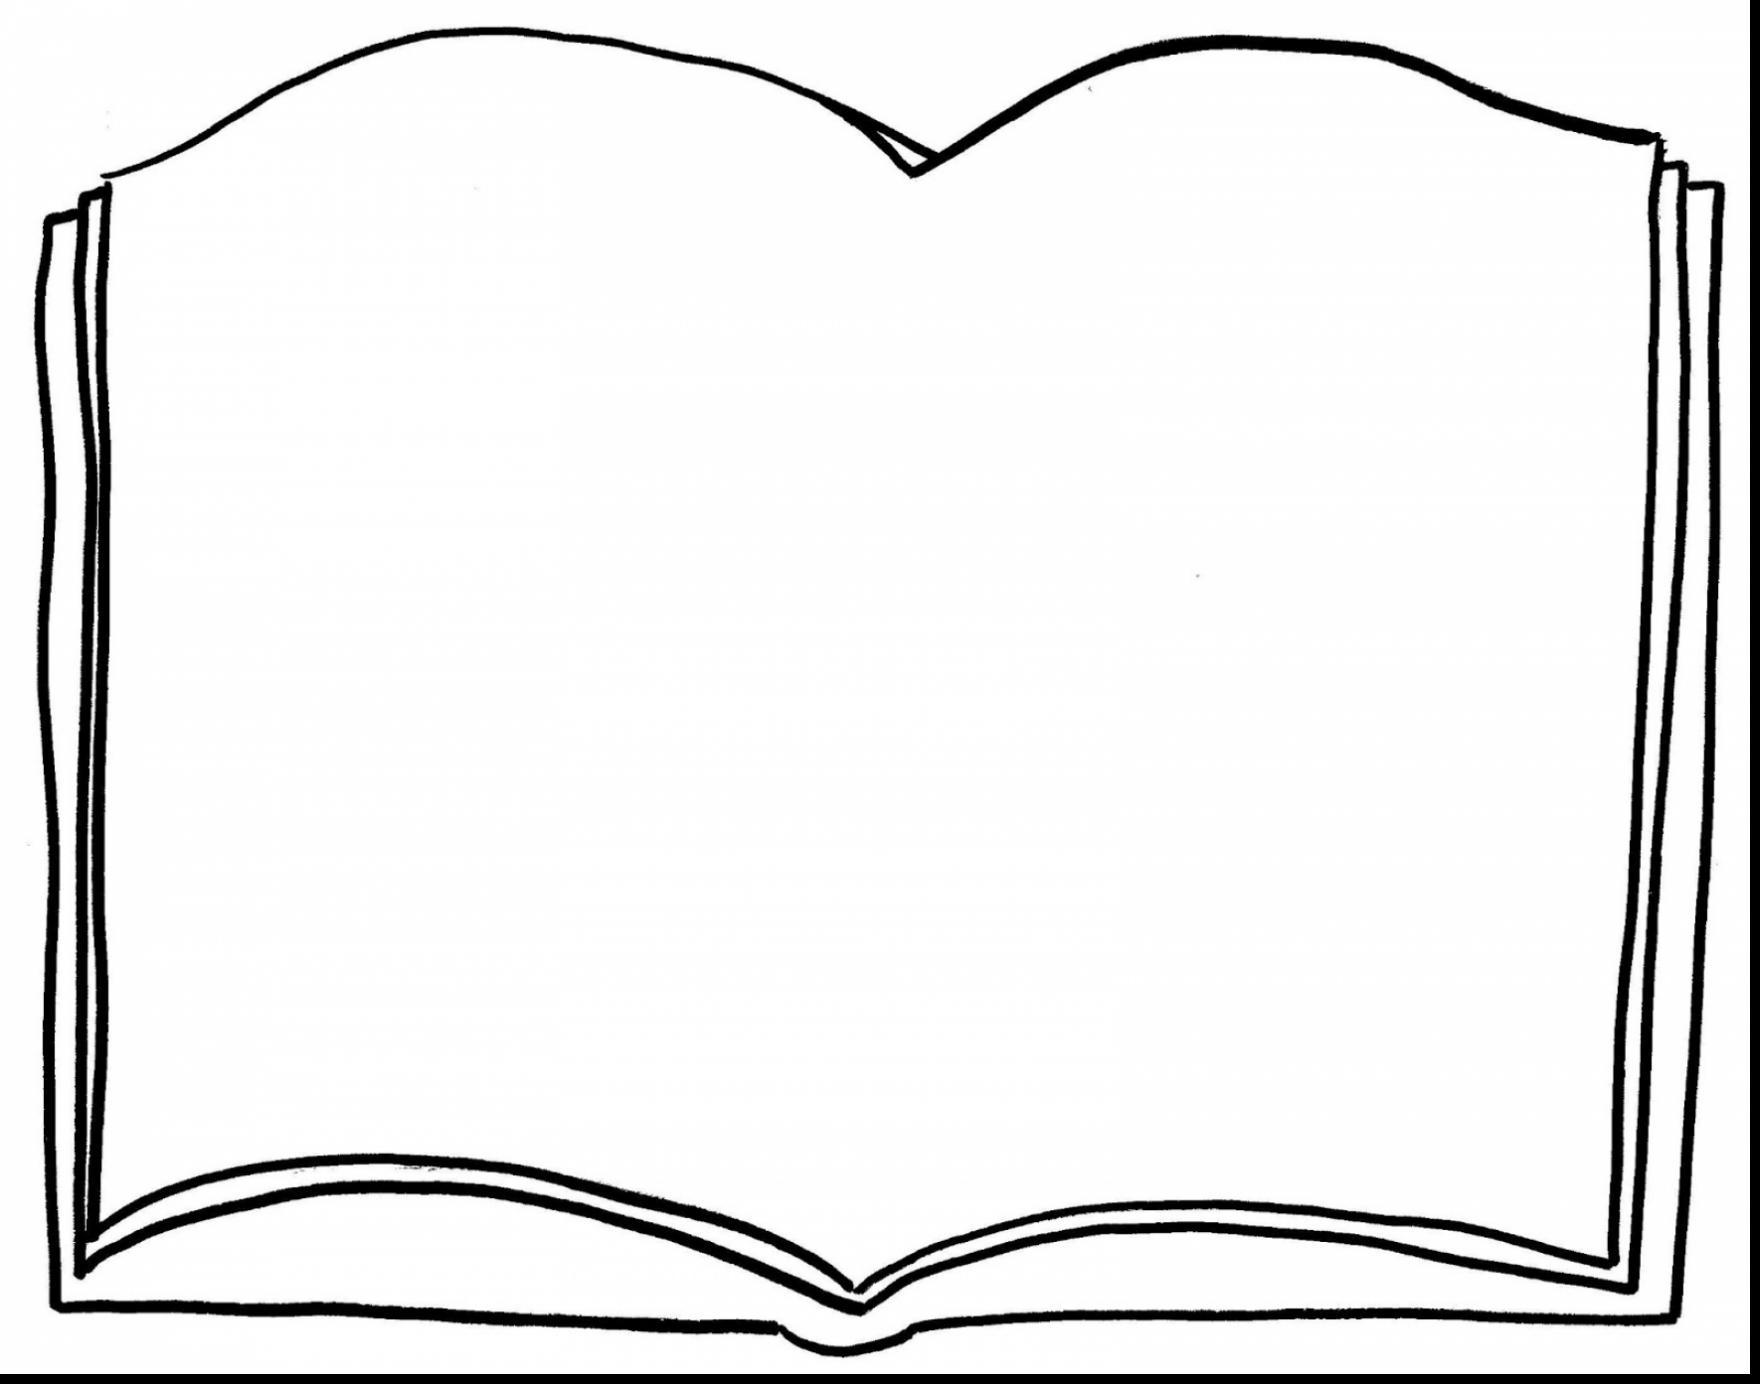 1760x1384 Blank Open Book Clip Art Monochrome Silhouette With Open Book